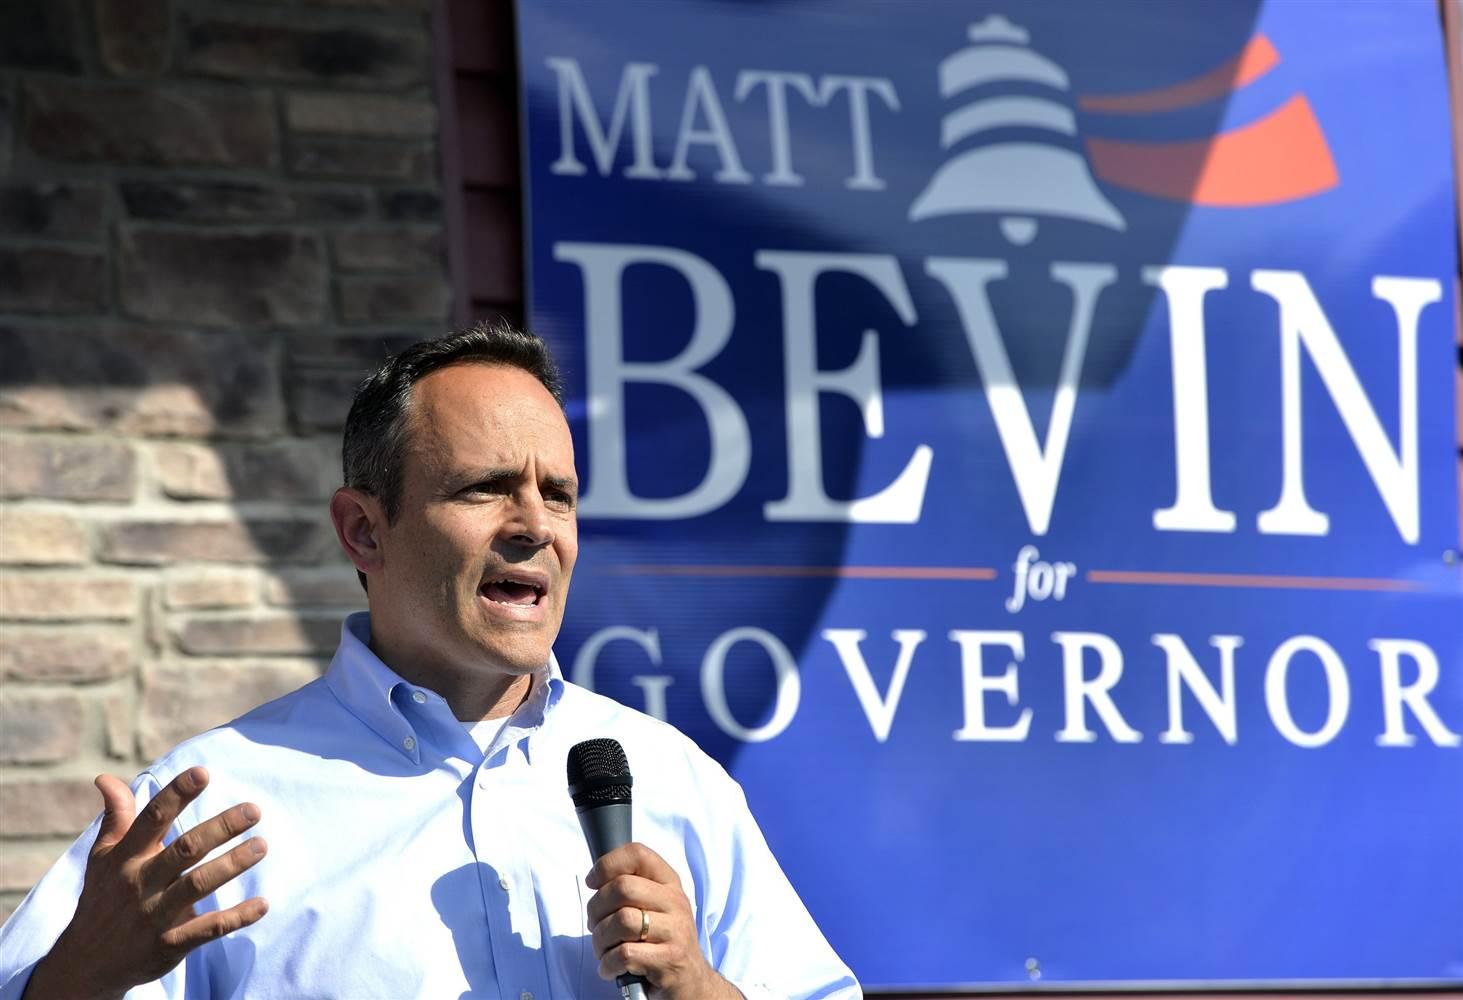 Matt Bevin Kentucky Governor